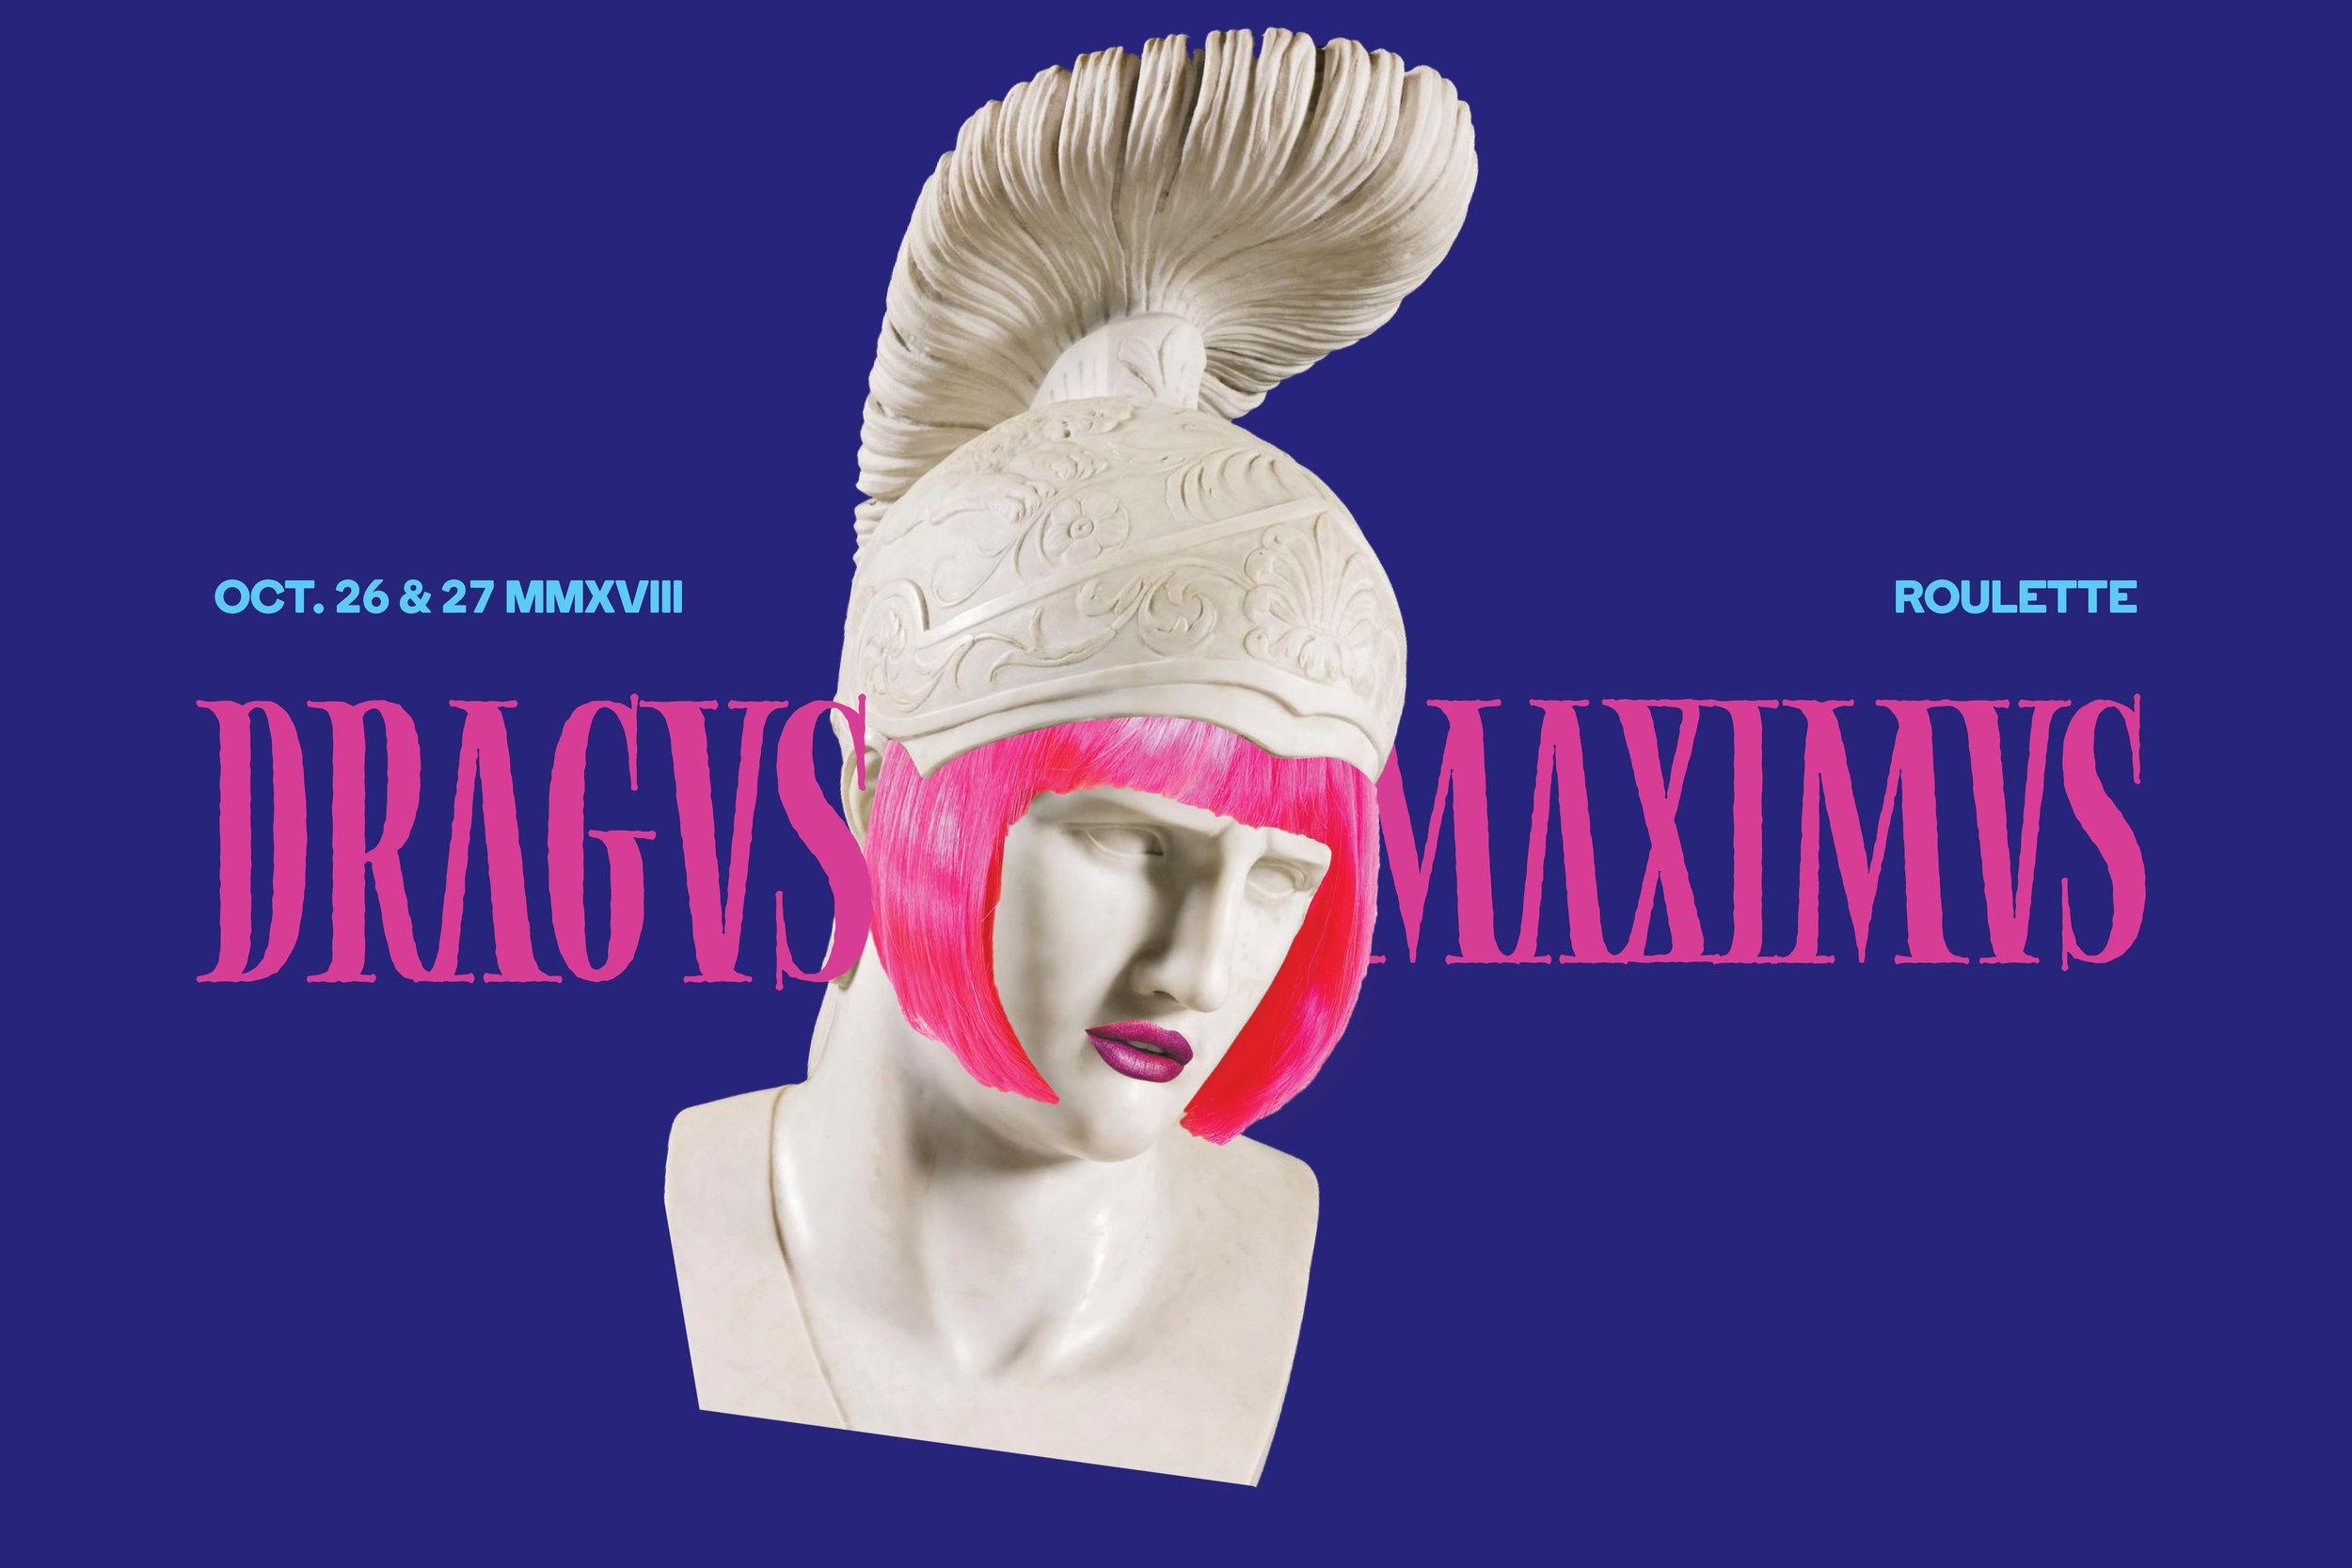 Opera Nightclub Halloween Oct 27 2020 Heartbeat Opera | DRAGUS MAXIMUS: Halloween Drag Extravaganza